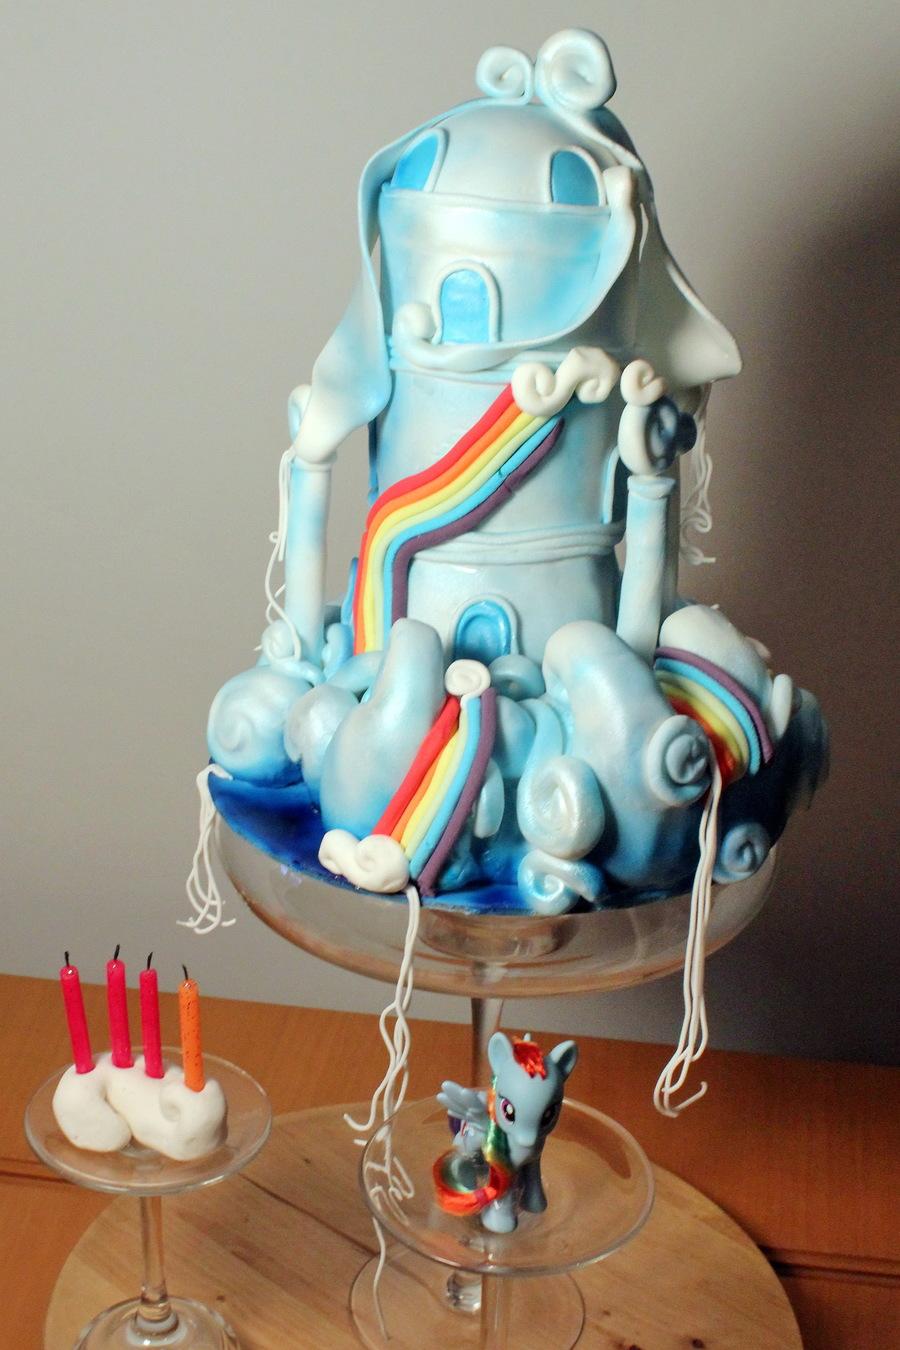 My Little Pony Rainbow Dash Cloud House Cake Cakecentral Com